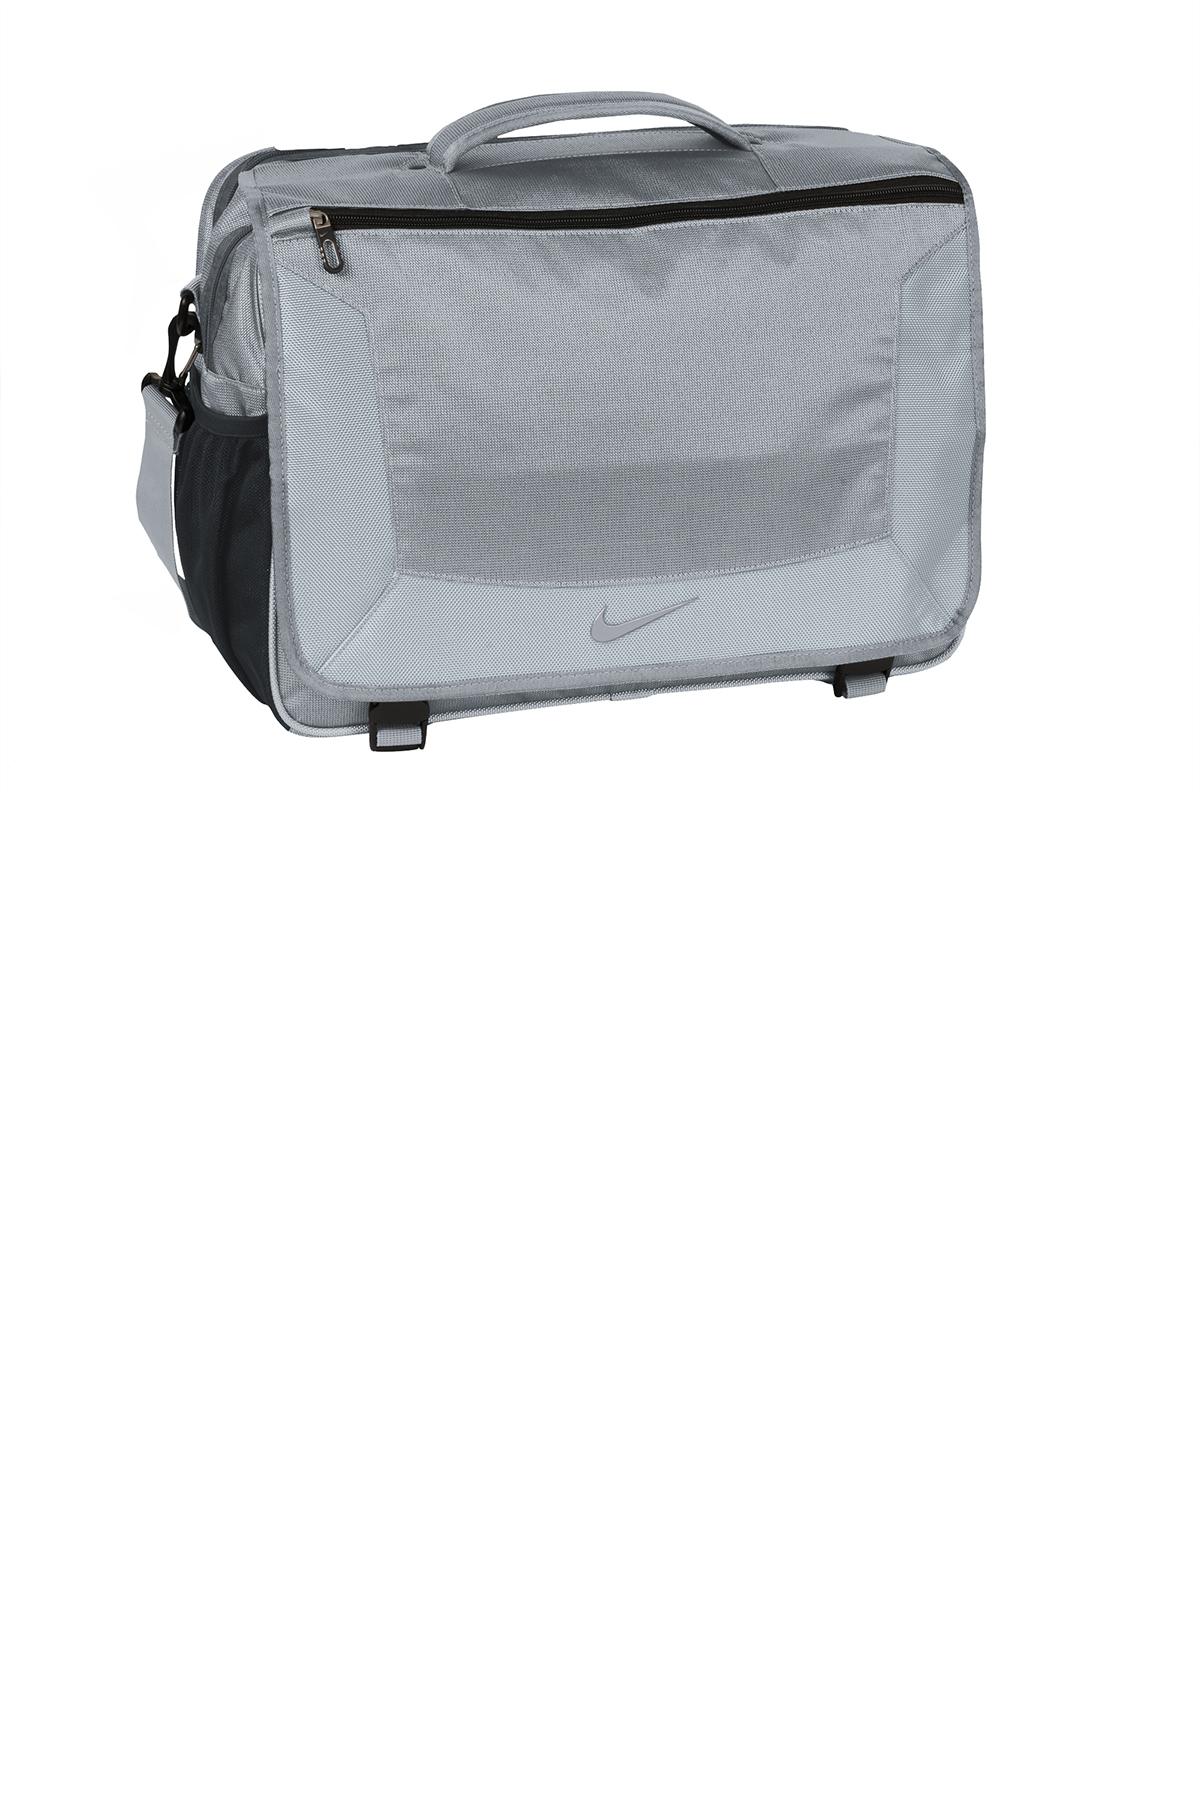 Nike Golf Elite Messenger   Briefcases Messengers   Bags   SanMar 4e668d3c8f